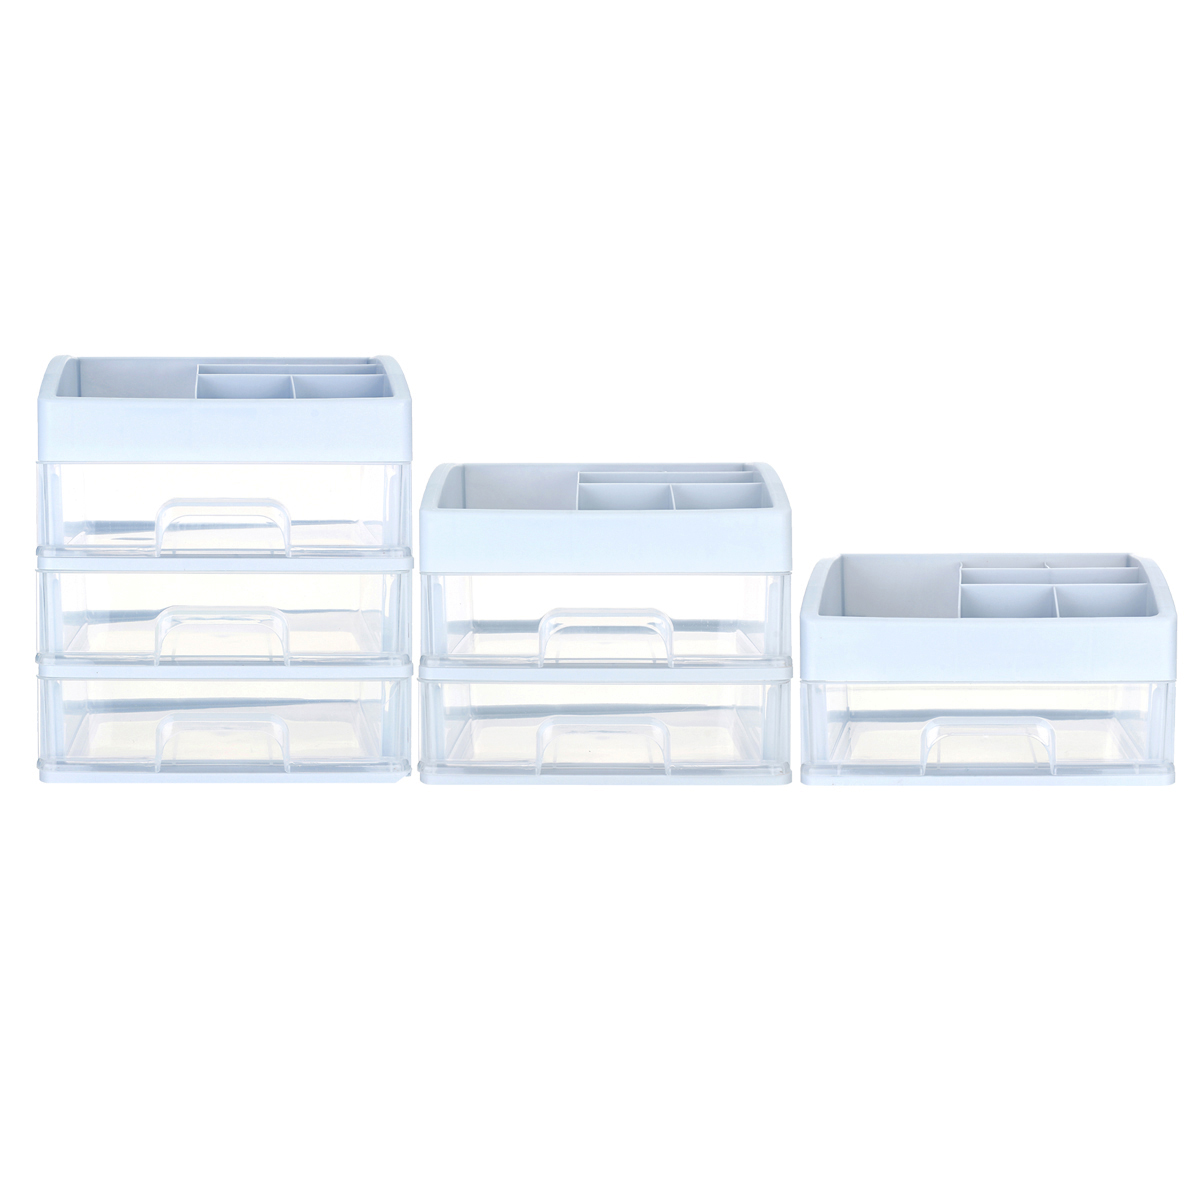 1/2/3 Layers Plastic Desktop Organizer Drawer Makeup Holder Box Make Sundry Storage Box Container